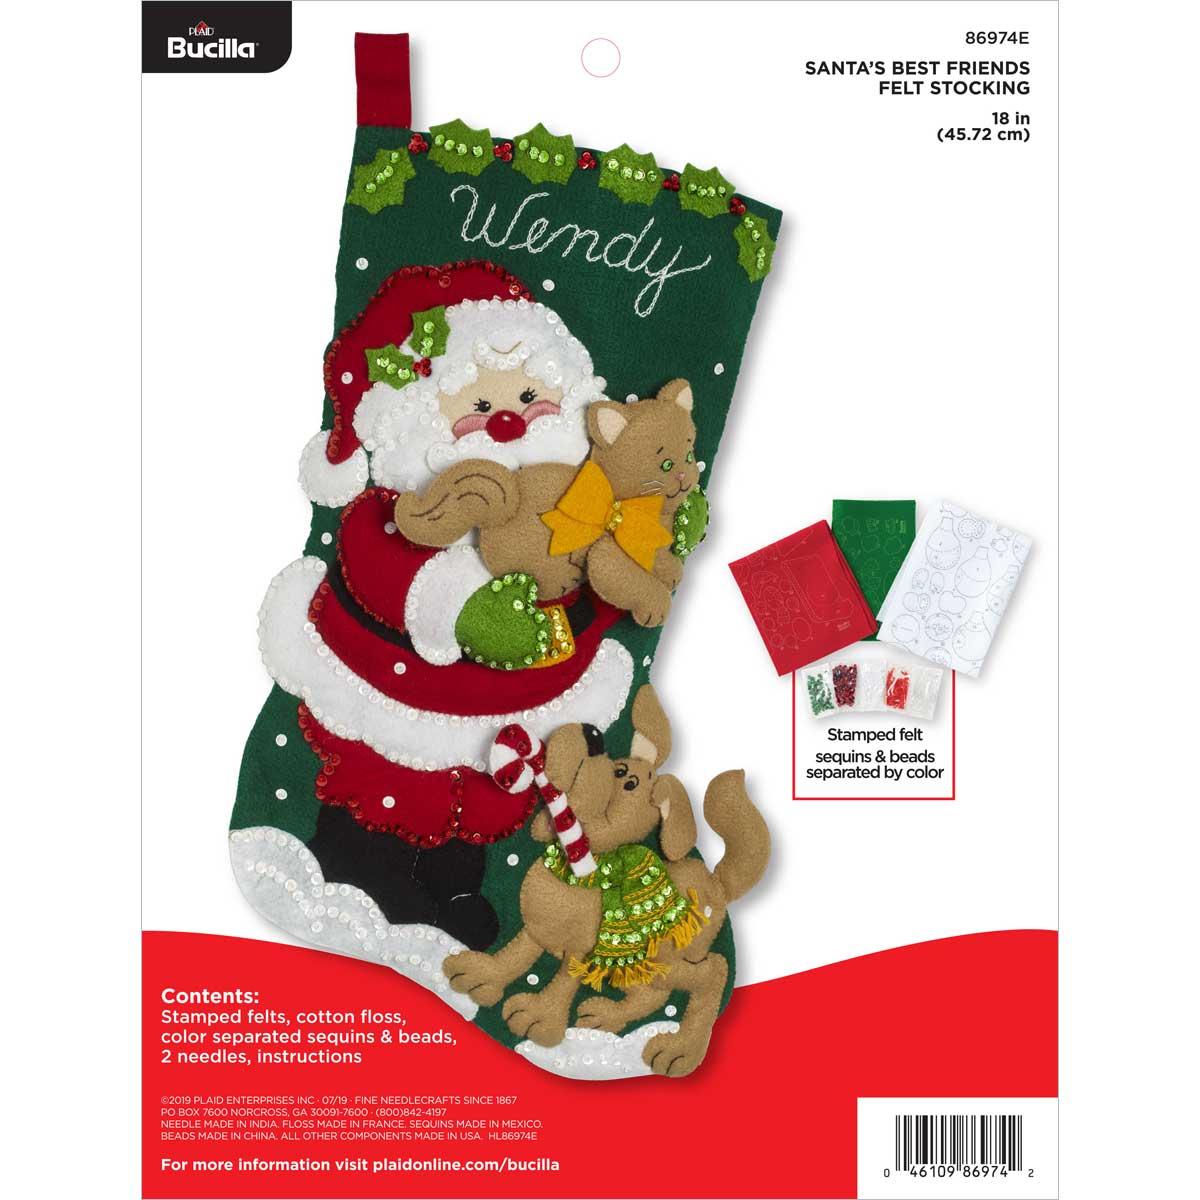 Bucilla ® Seasonal - Felt - Stocking Kits - Santa's Best Friend - 86974E